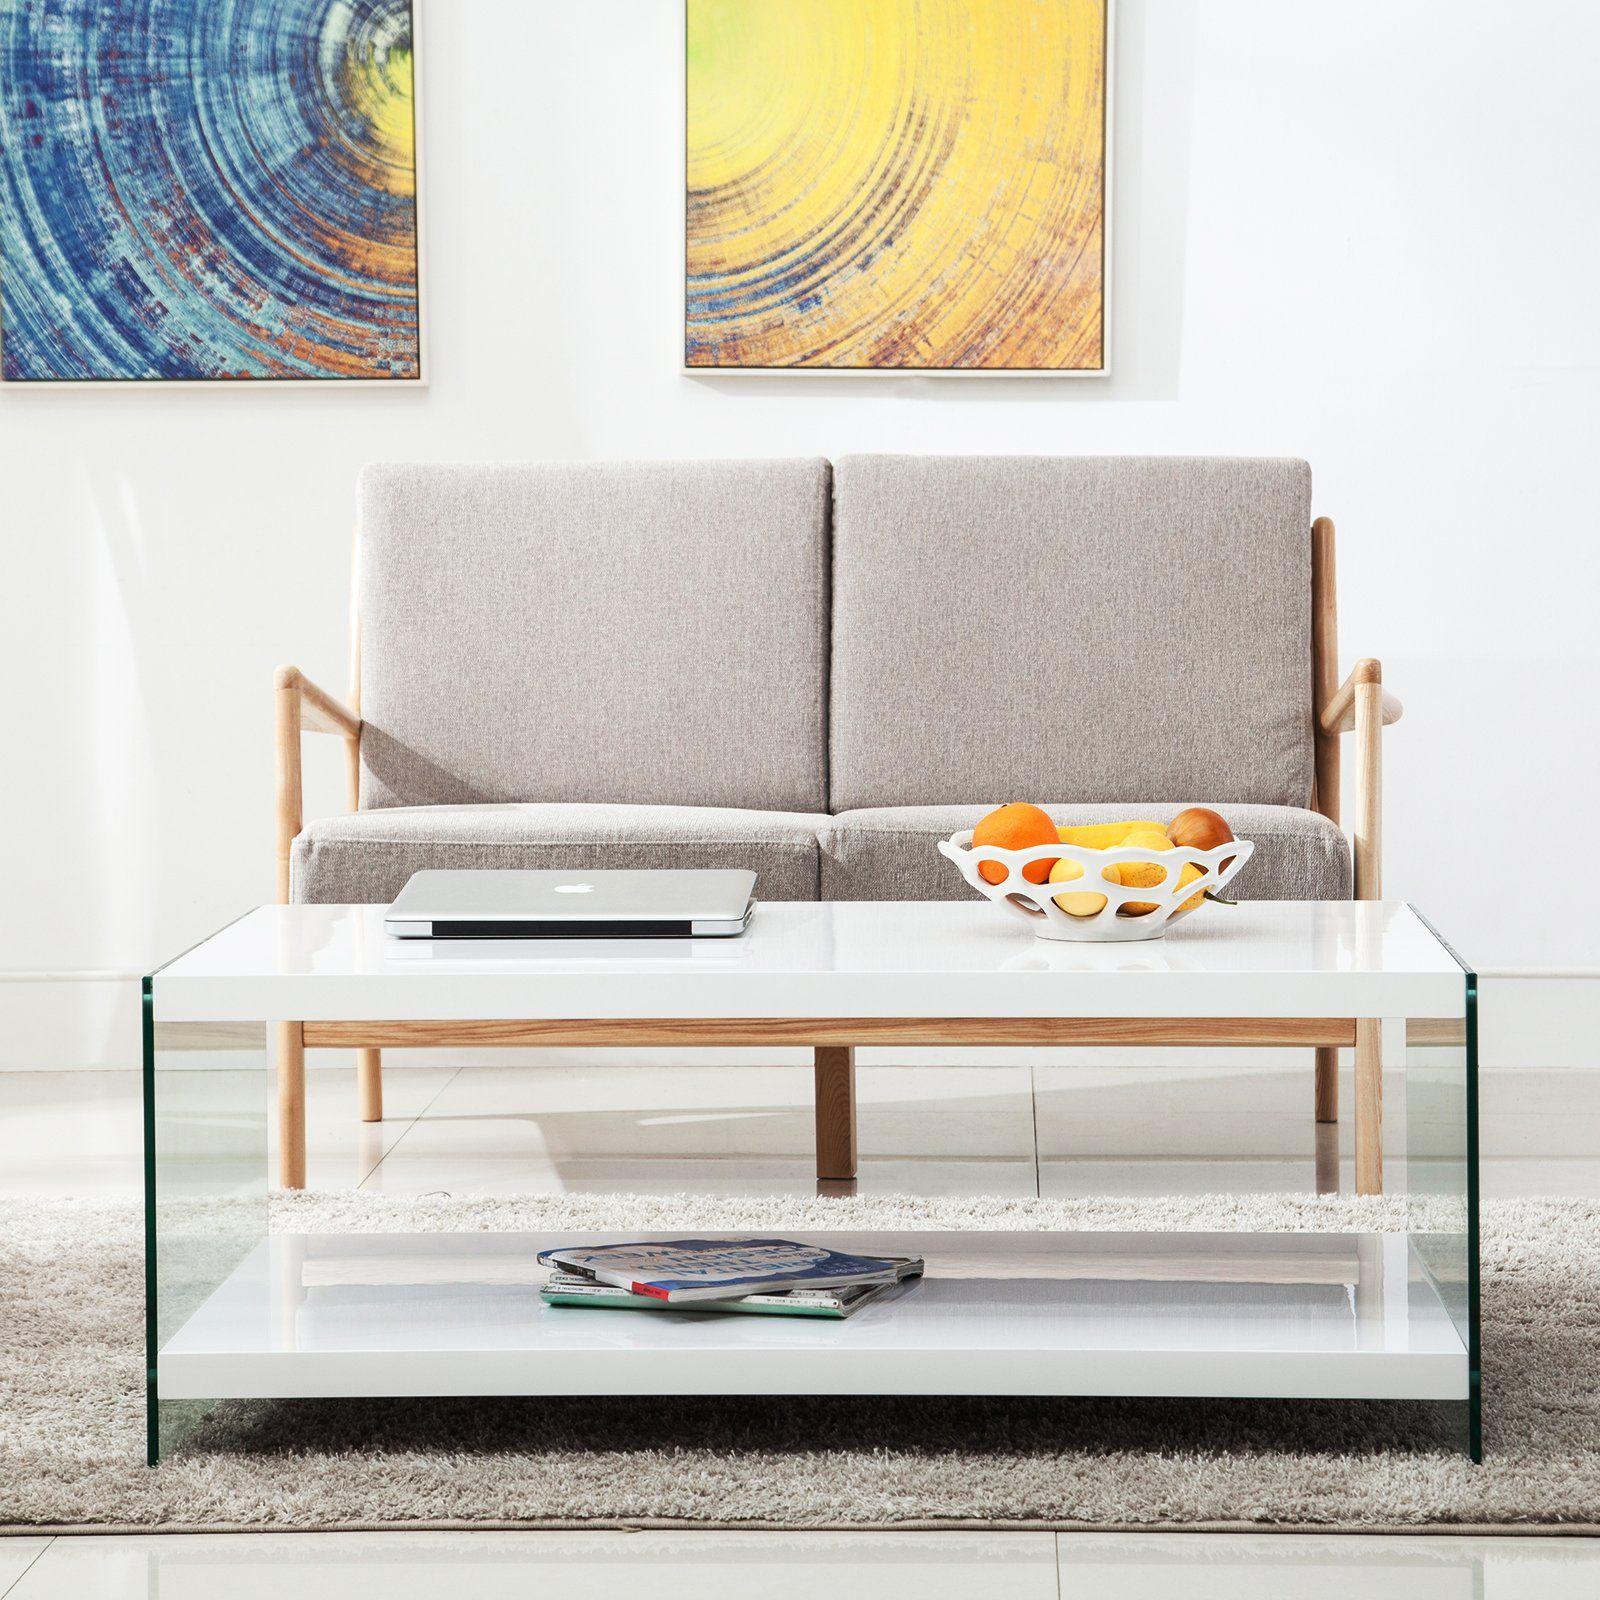 Mecor Coffee Table Modern Mdf Two Tier Rectangular Tea Table With Storage Bottom Shelf Home Office Furniture Coffee Table Home Office Furniture Home Decor [ 1600 x 1600 Pixel ]